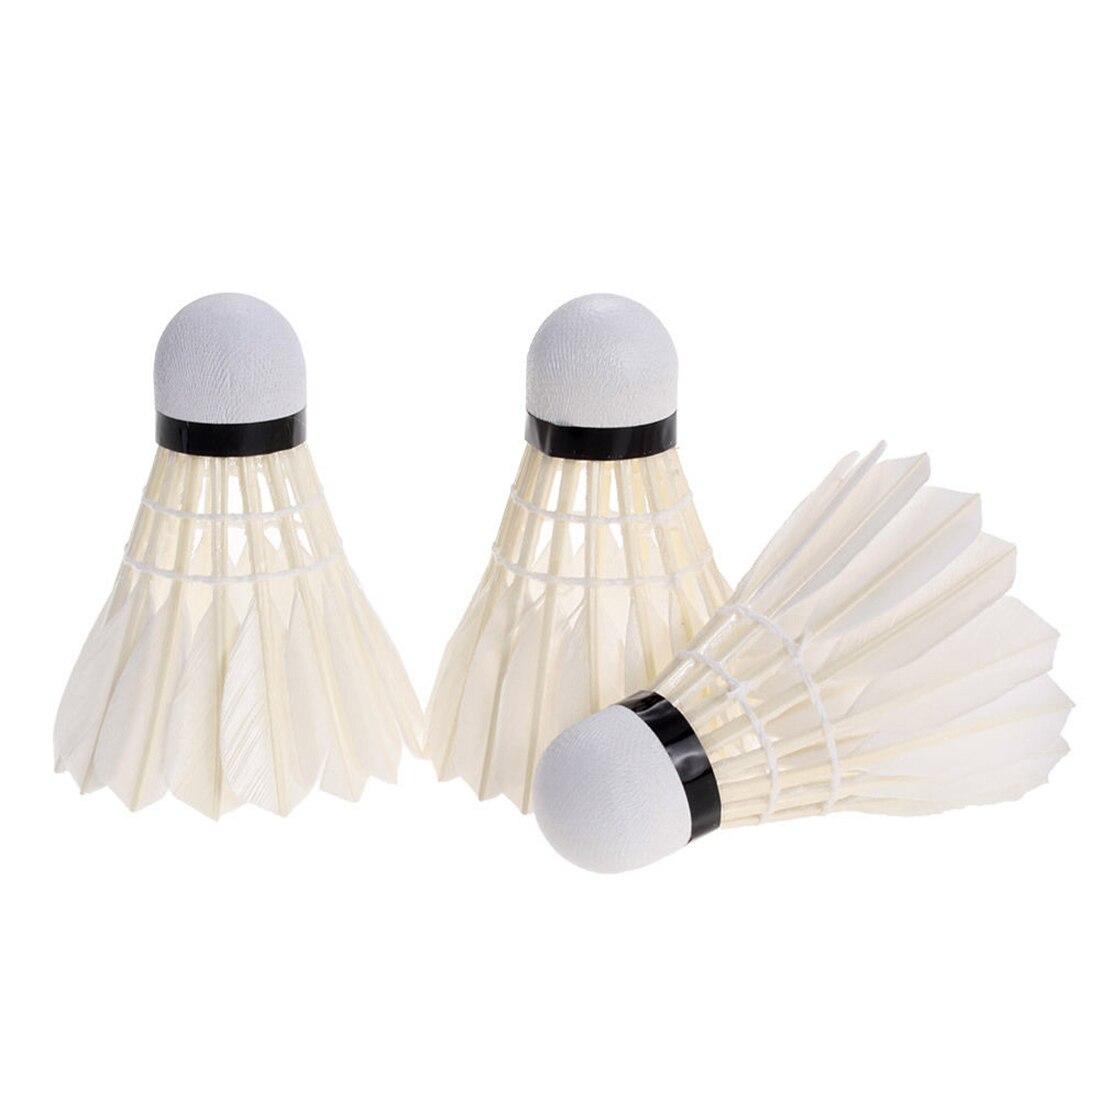 3 Pcs Portable White Duck Feather Shuttlecock Training Badminton Balls Shuttlecocks Sport Products